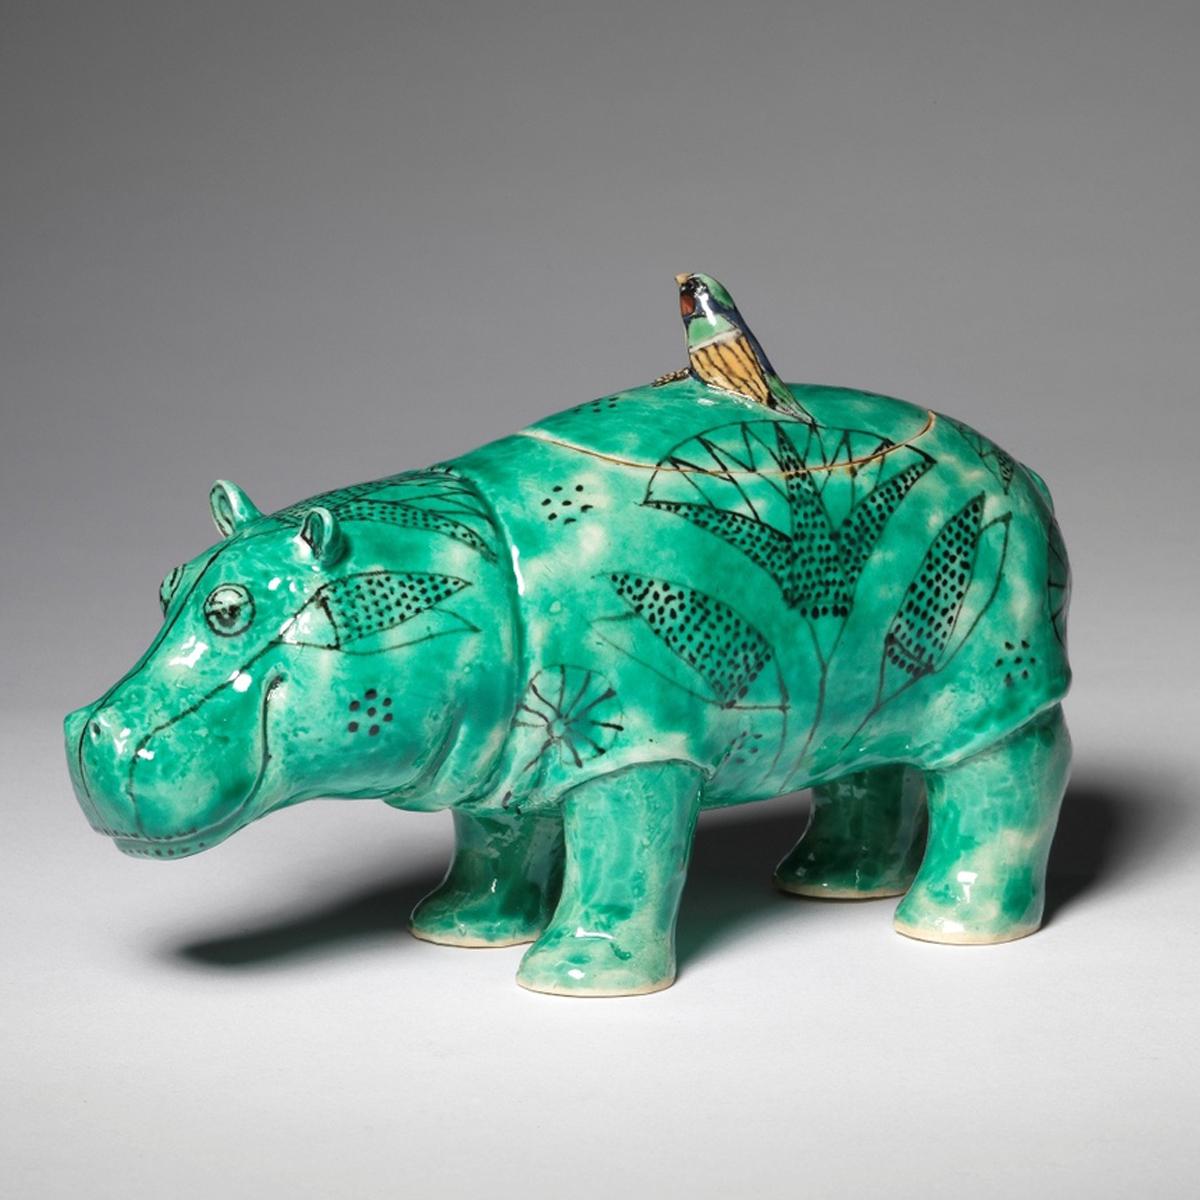 Hippo Pot, standing